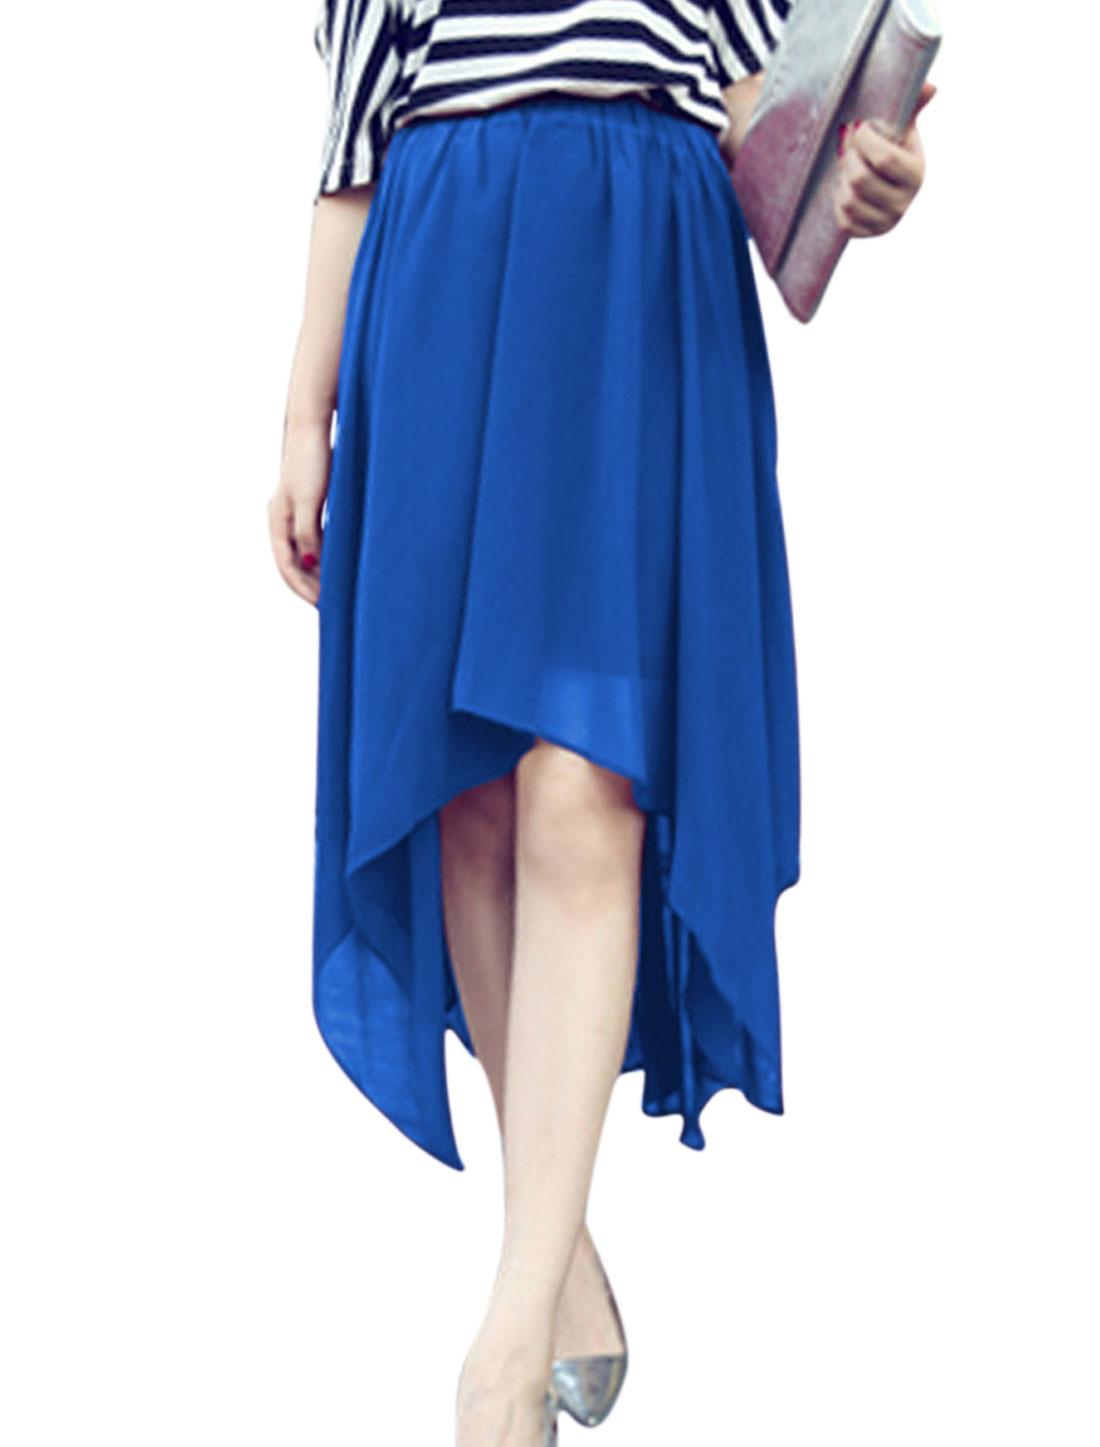 Women Fashion Style Irregular Hem Elegance Rolay Blue Chiffon Skirt XS